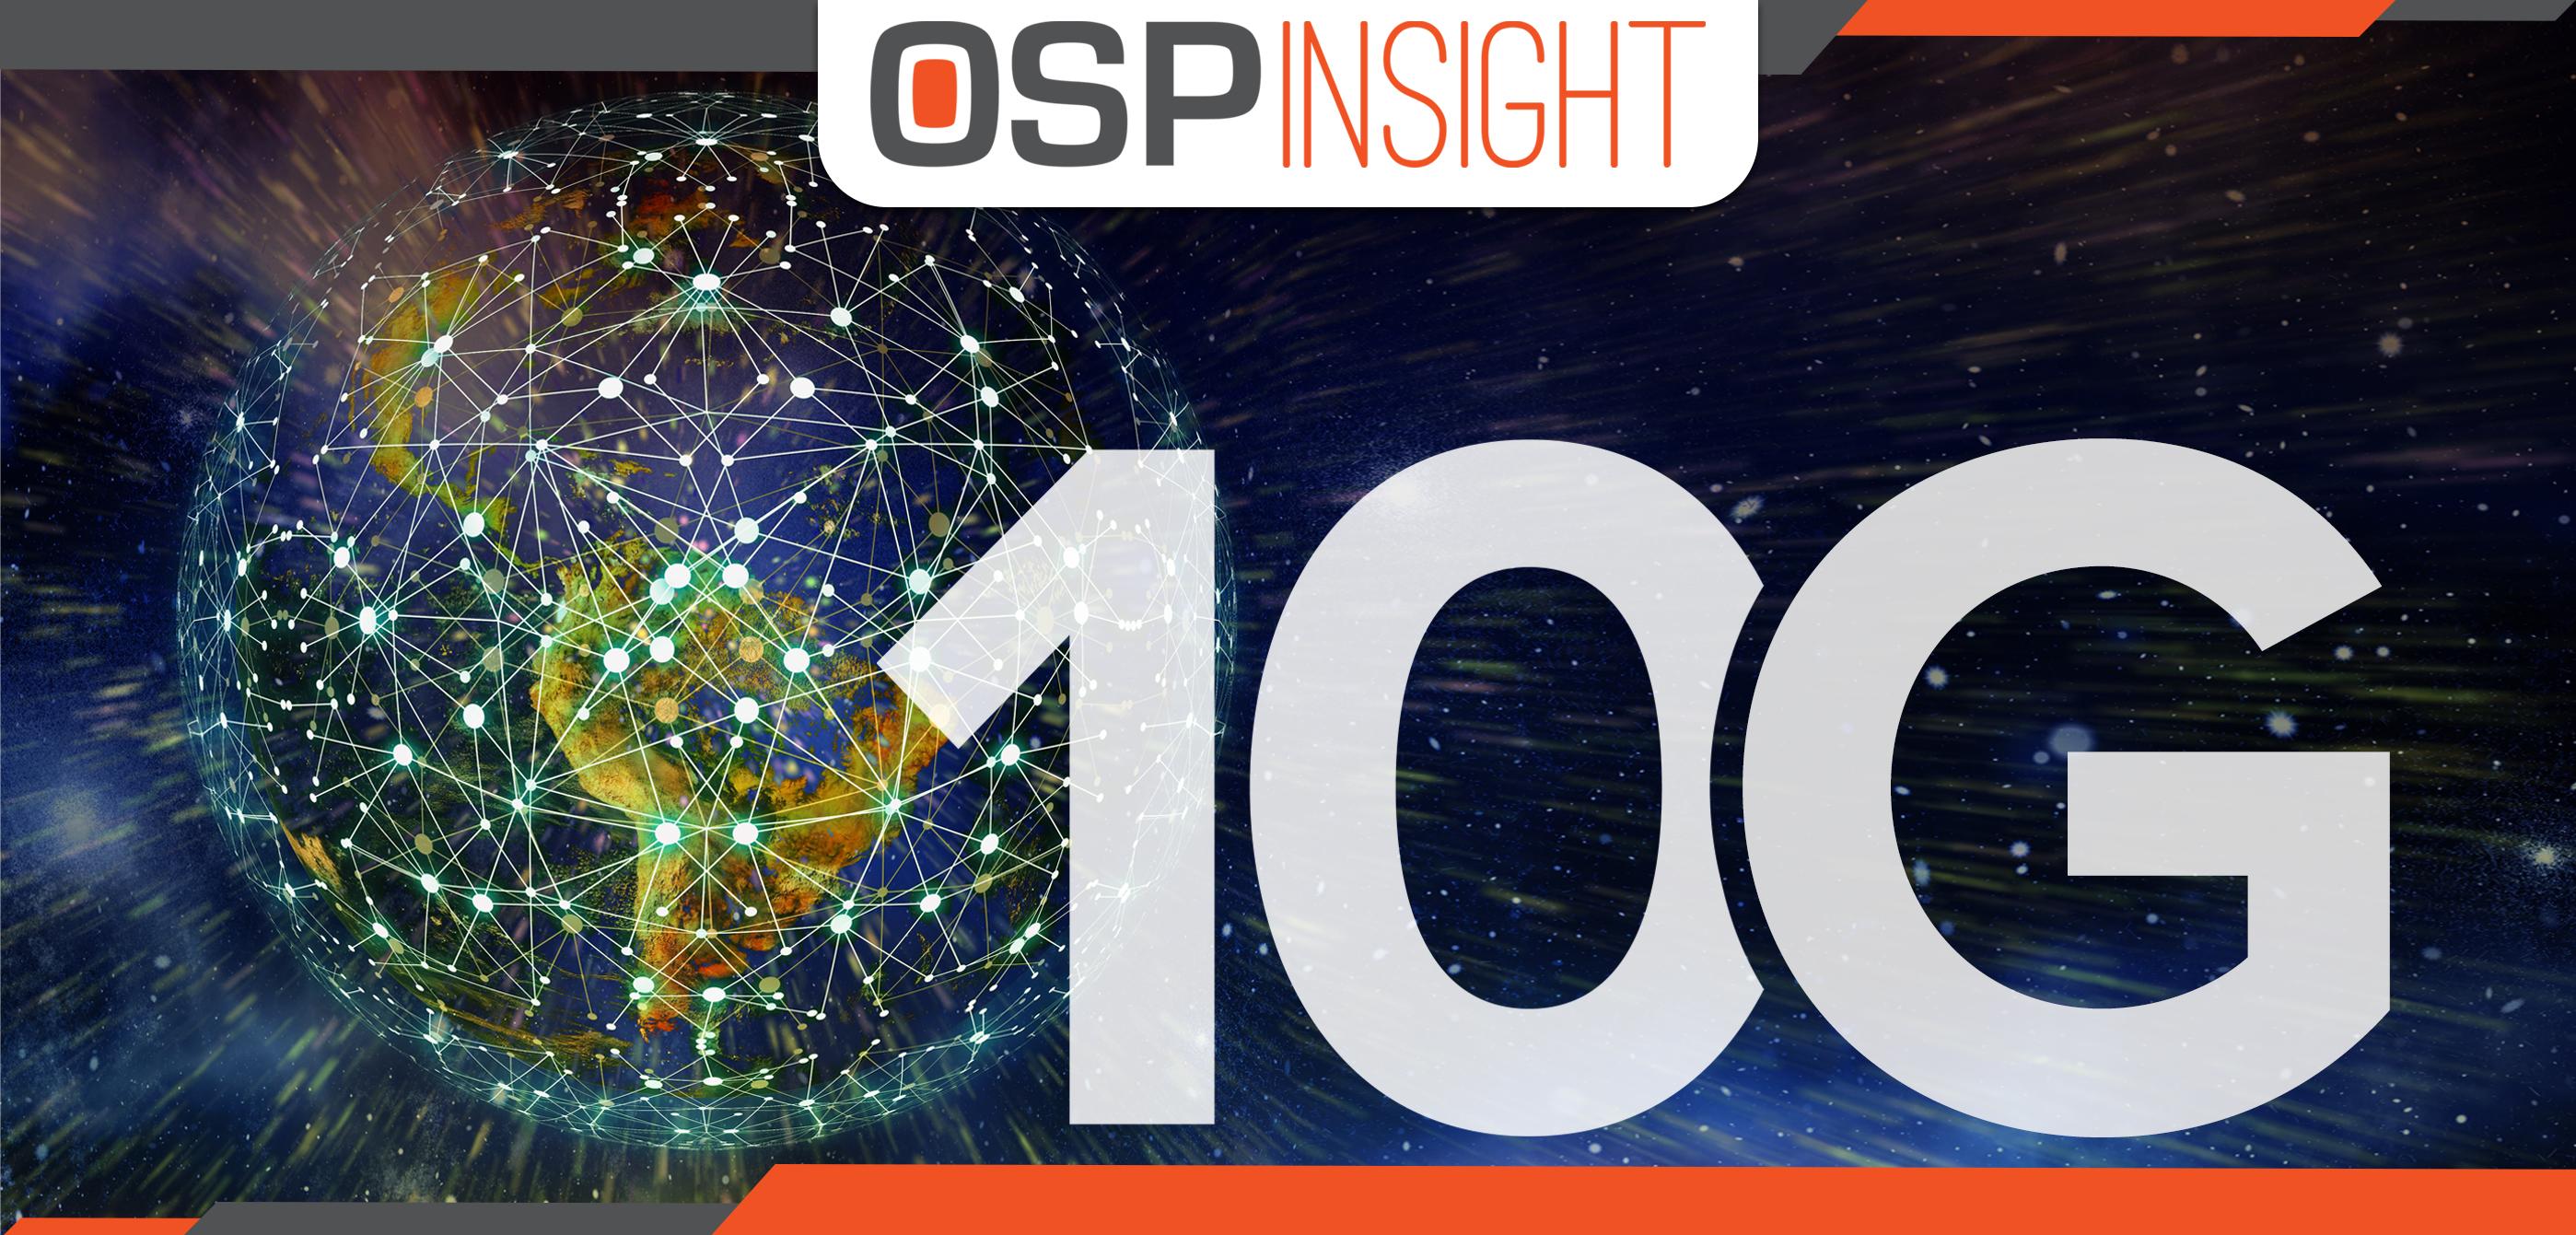 Next-Gen Broadband - 10G Networks (featured image)-1